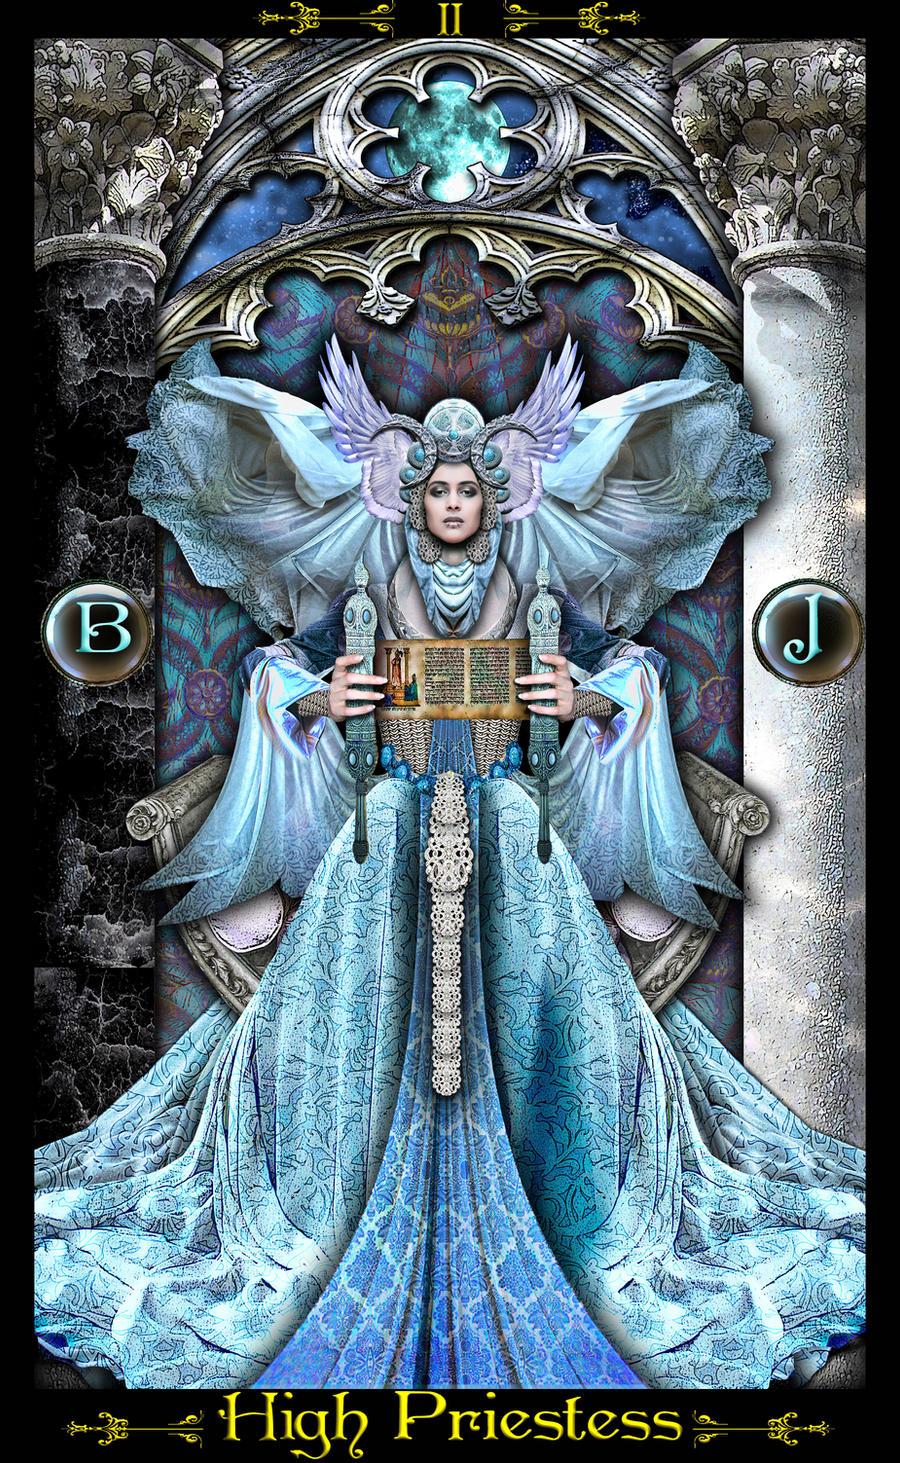 The High Priestess - 646.0KB